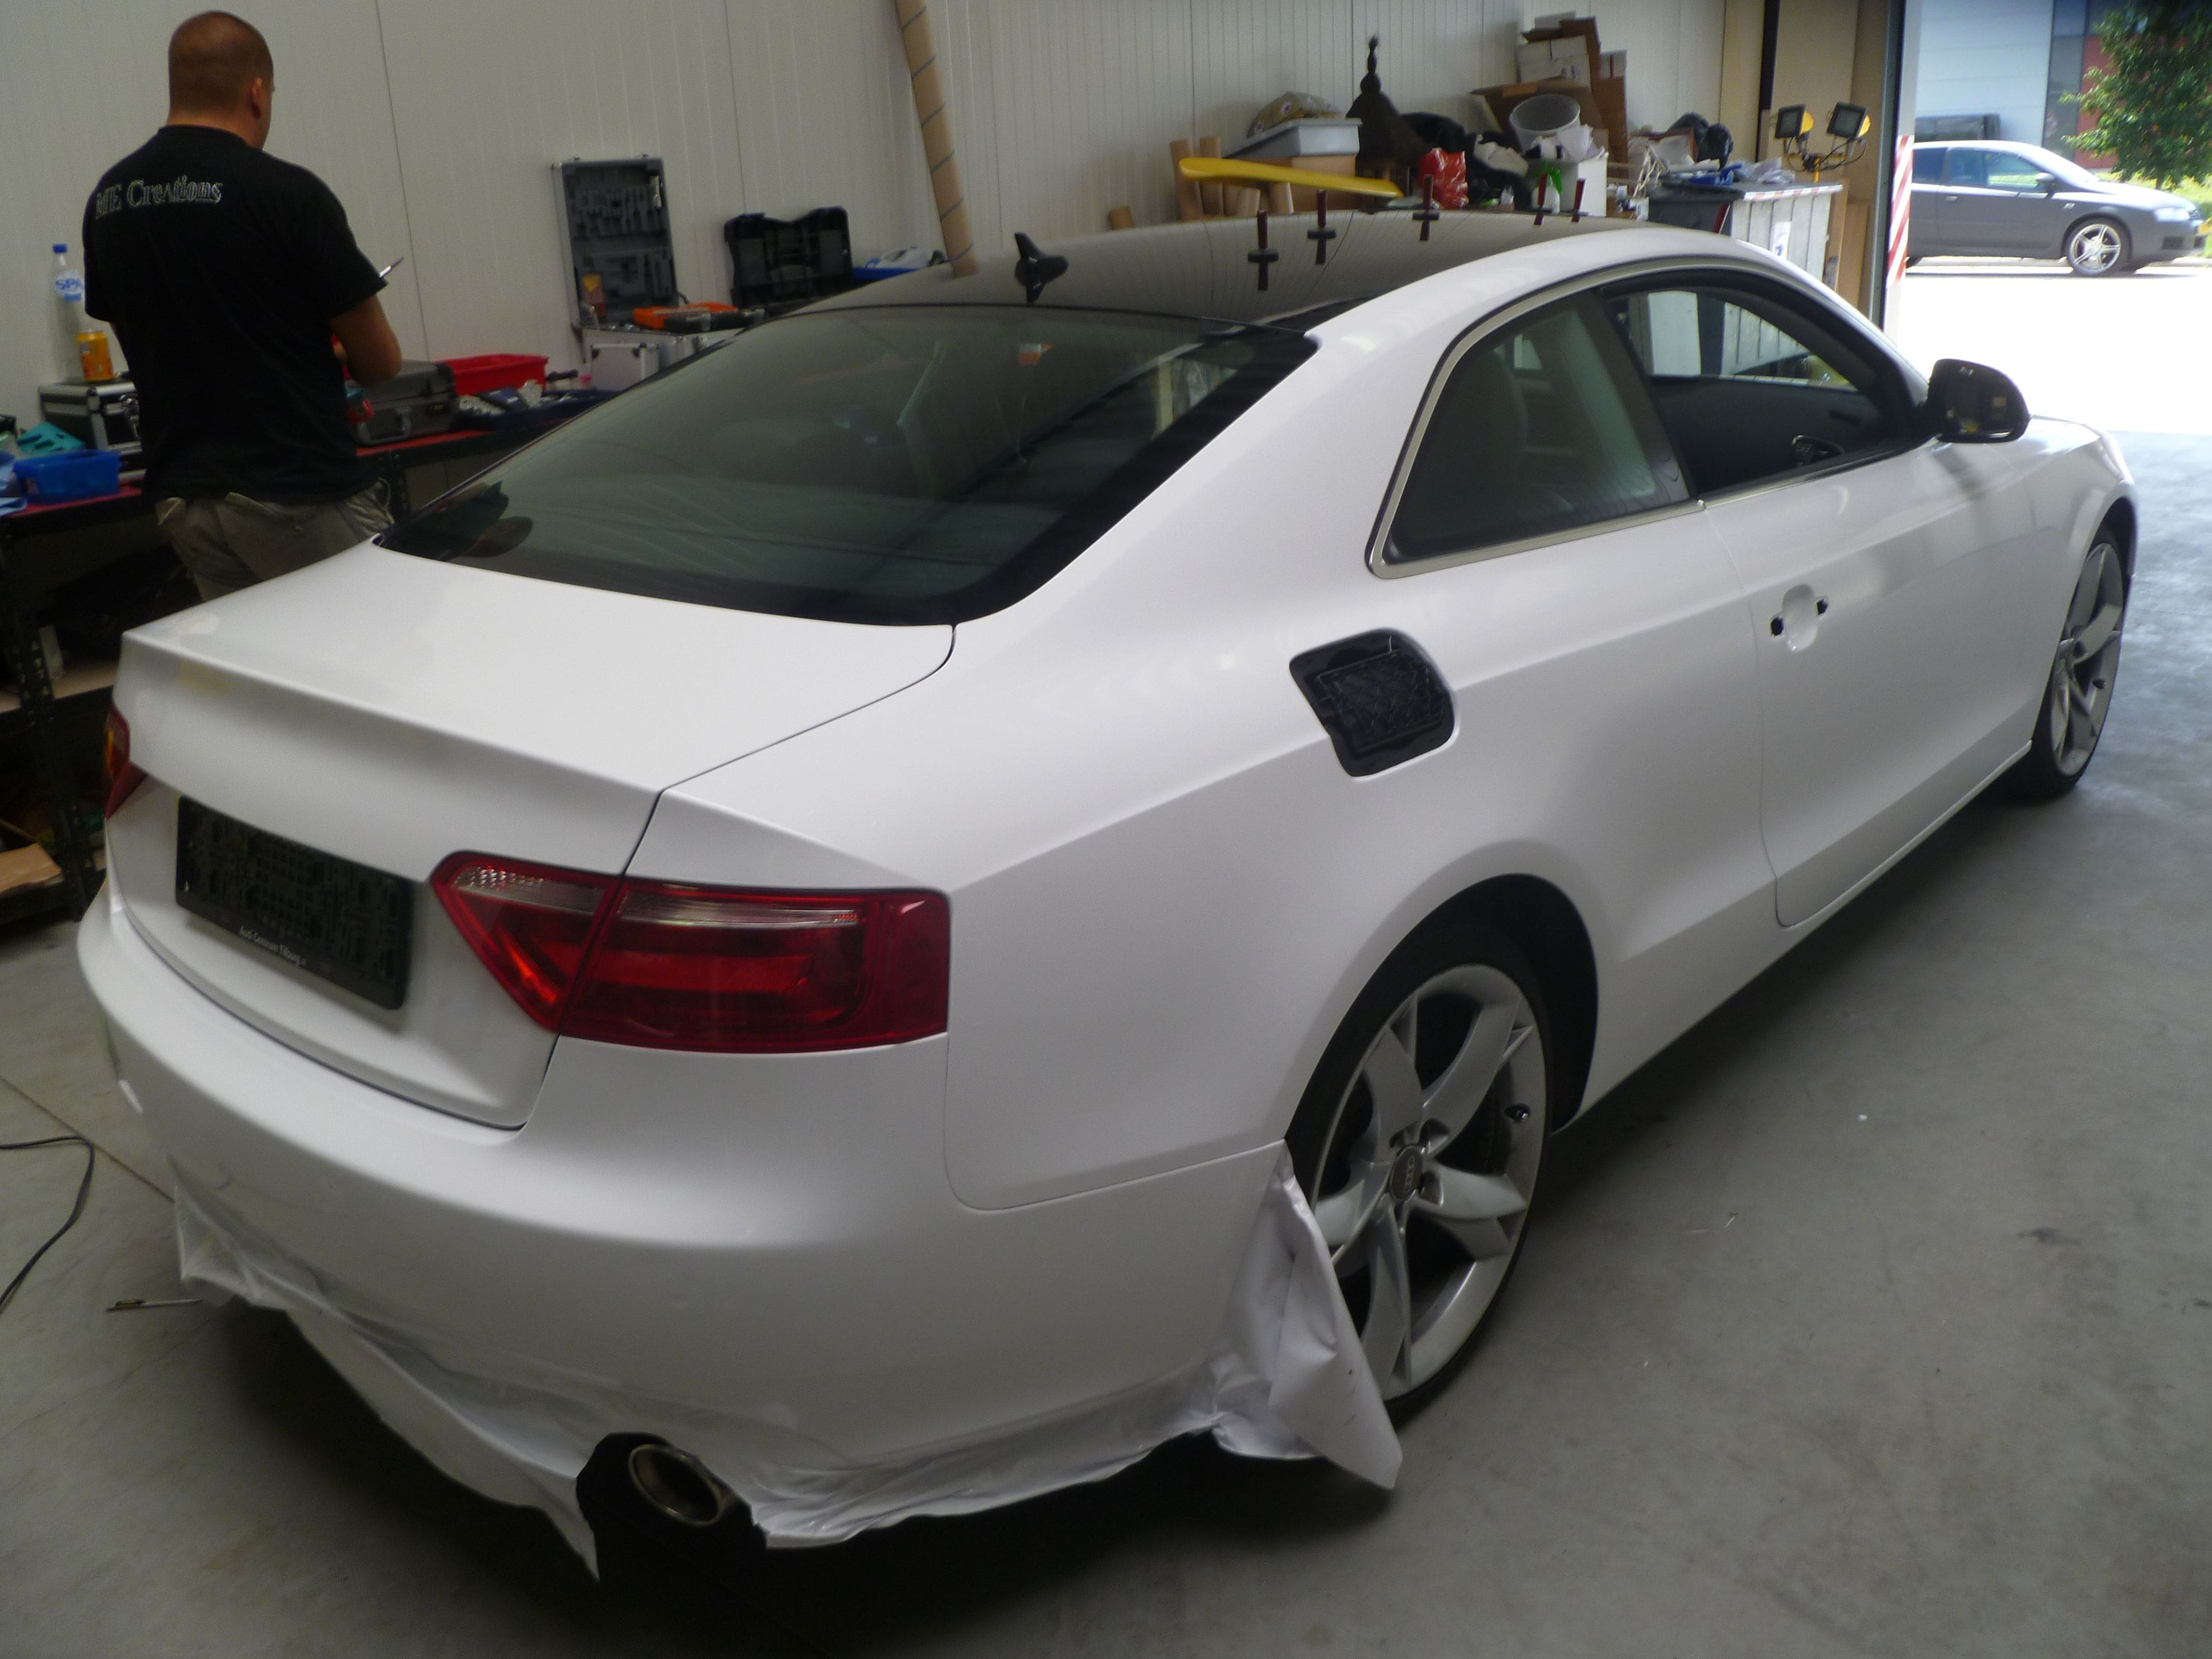 Audi A5 coupe met Metallic Witte Wrap, Carwrapping door Wrapmyride.nu Foto-nr:4722, ©2021